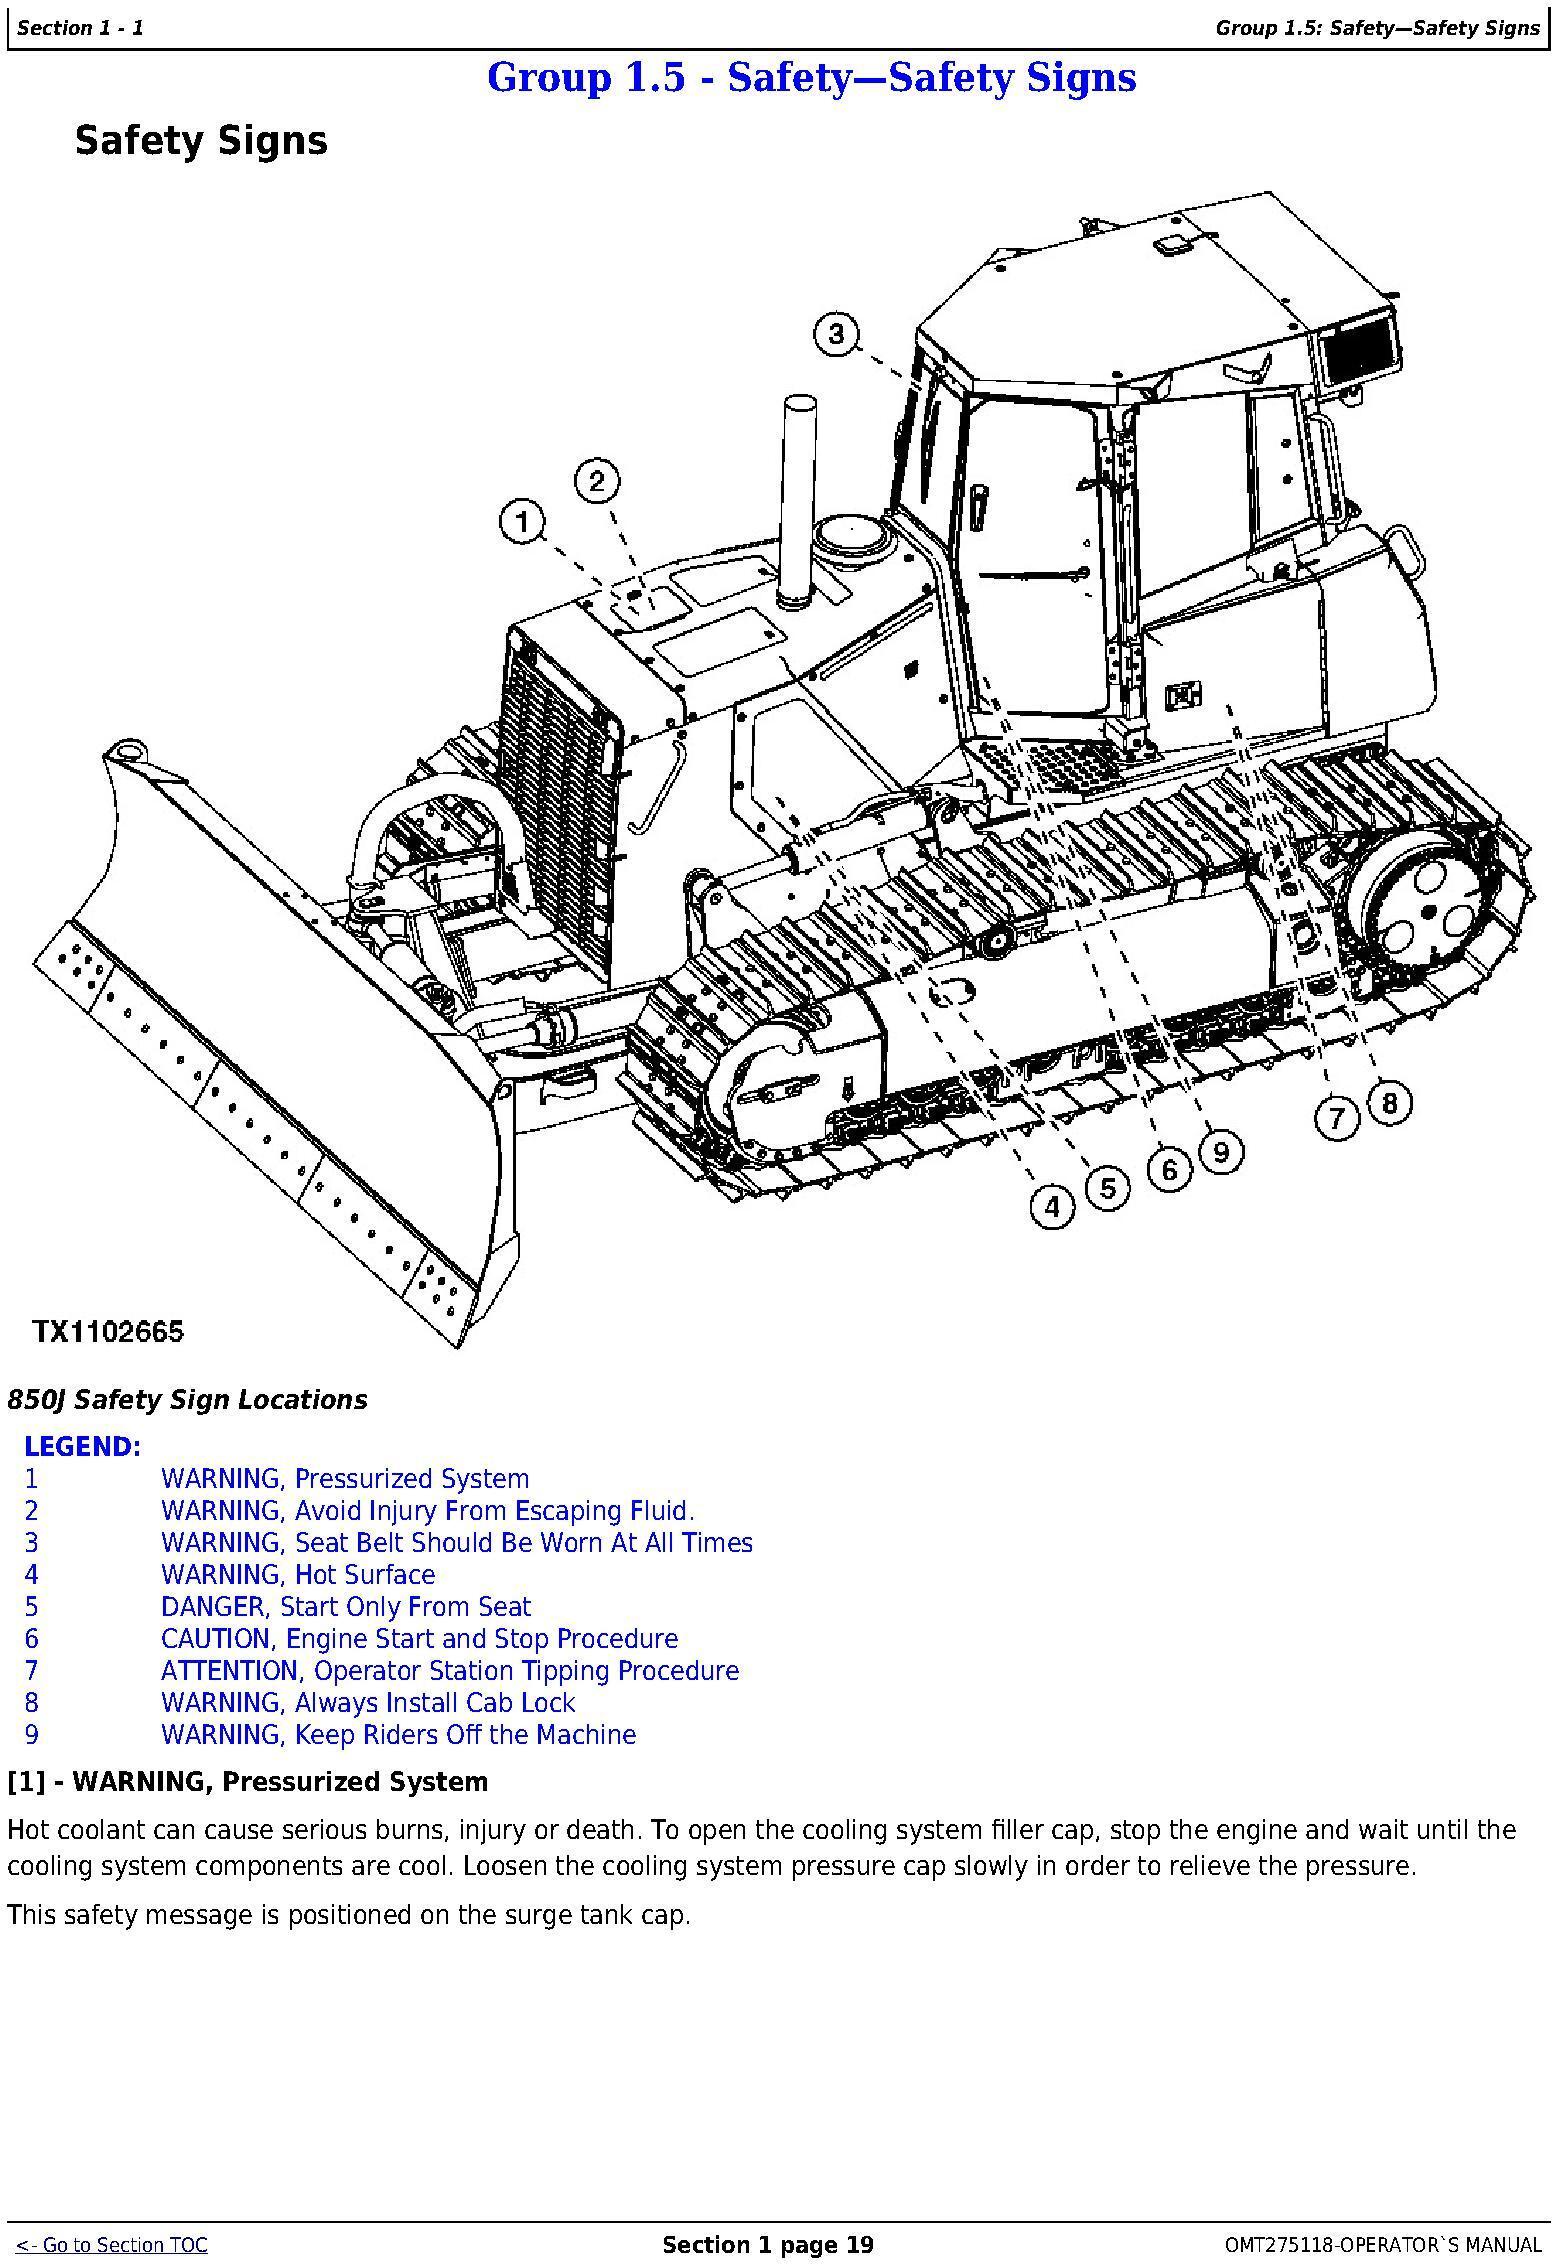 OMT275118 - John Deere 850J Crawler Dozer (PIN: 1T0850JX**C216392-) Operator's Manual - 1